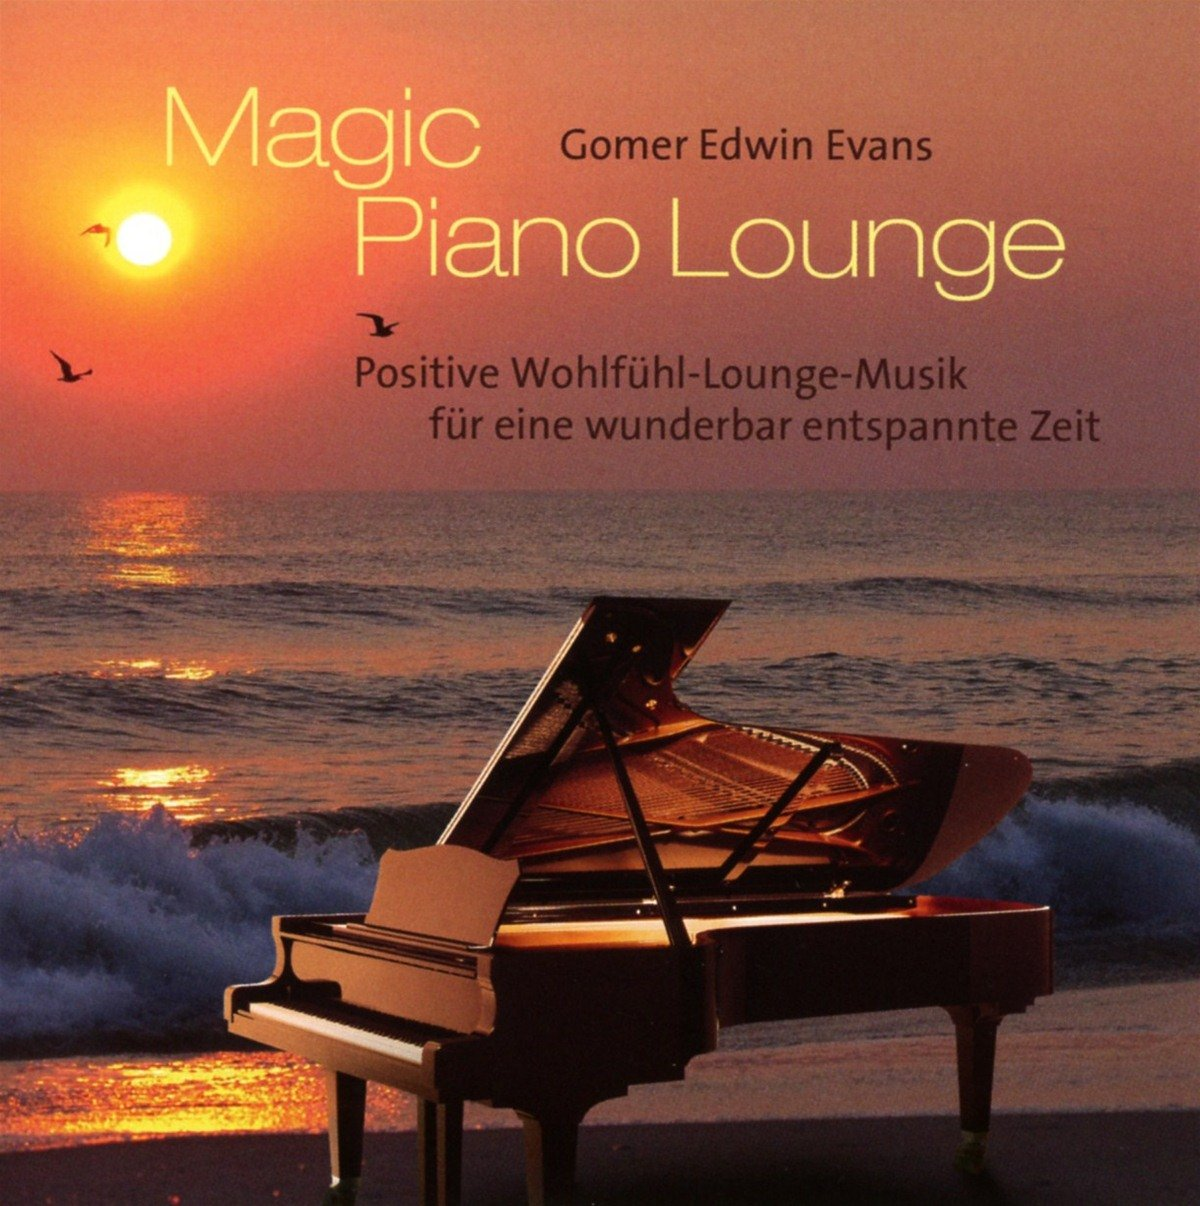 Magic Piano Lounge: Positive Wohlfühl-Lounge-Musik